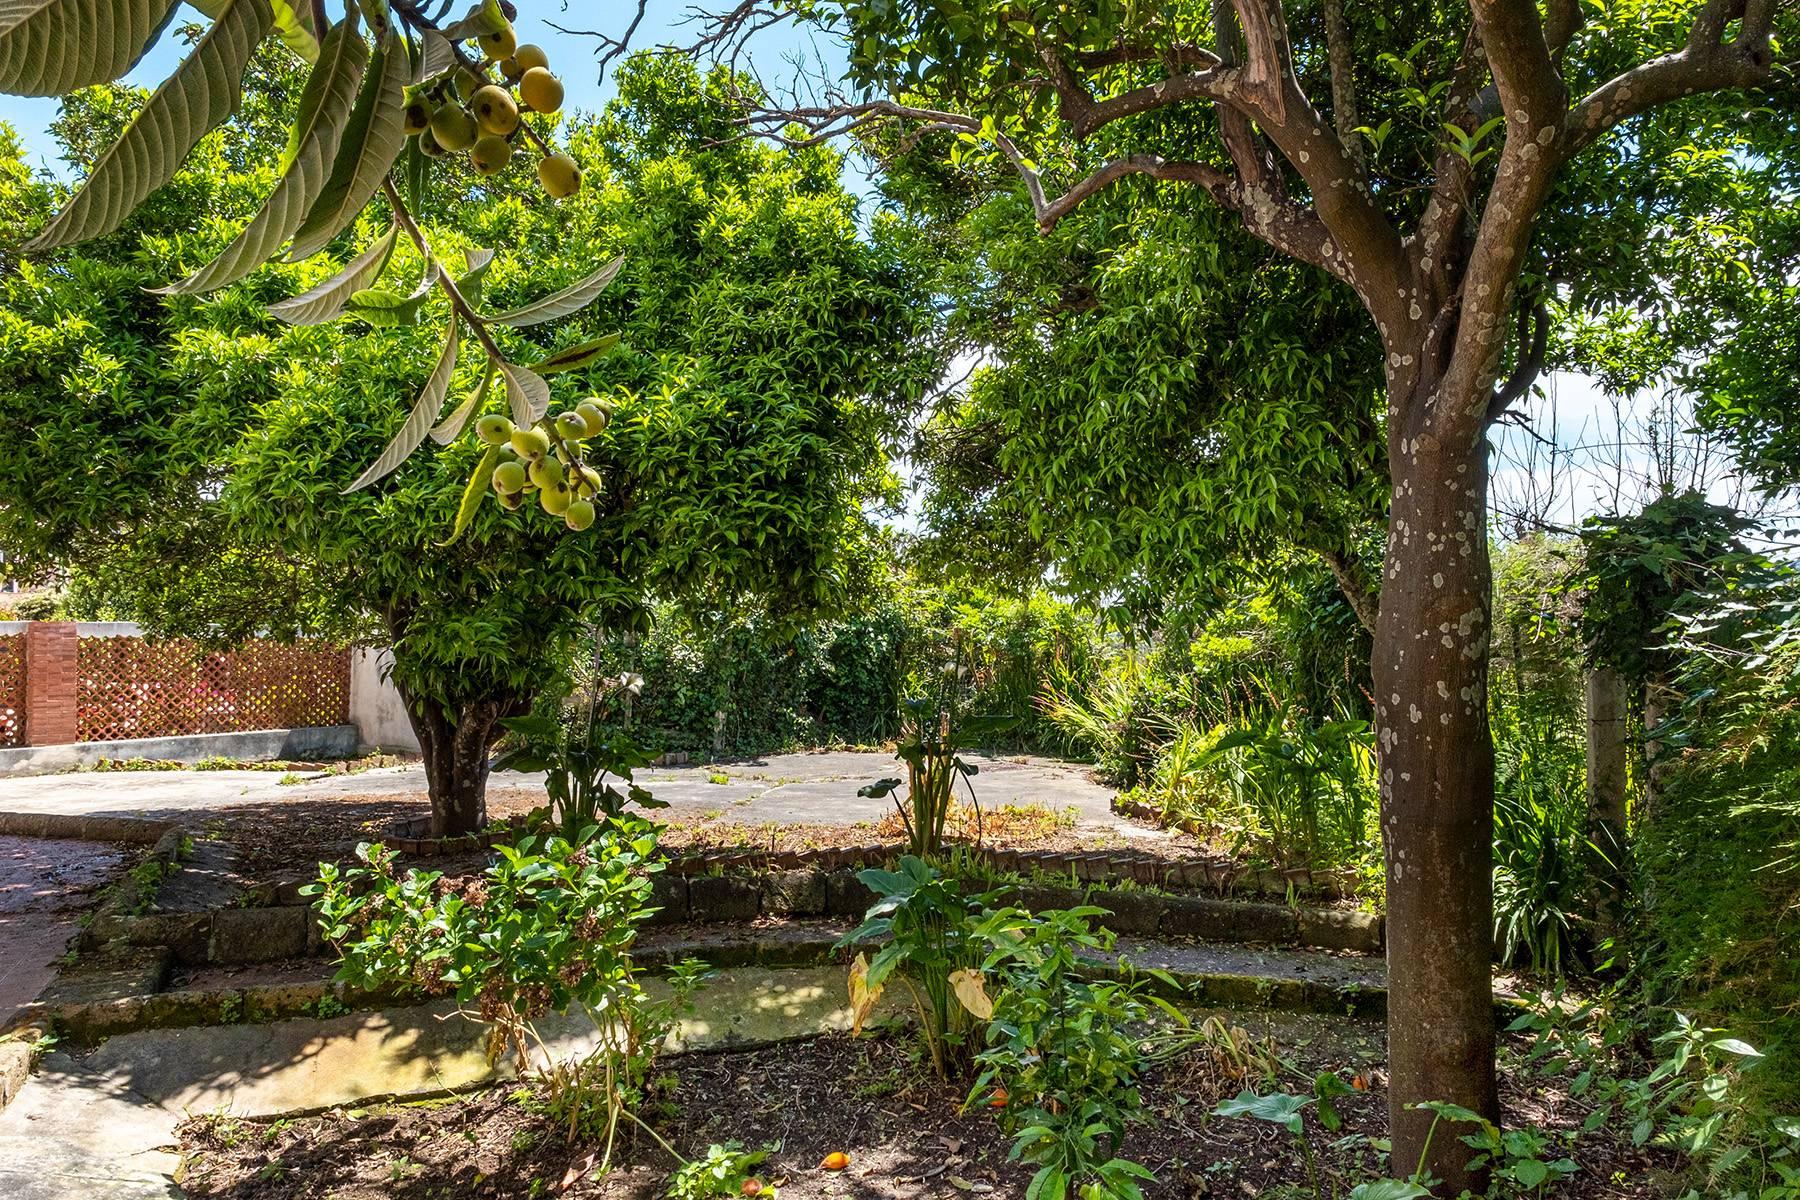 Casa indipendente in Vendita a Procida: 5 locali, 300 mq - Foto 8